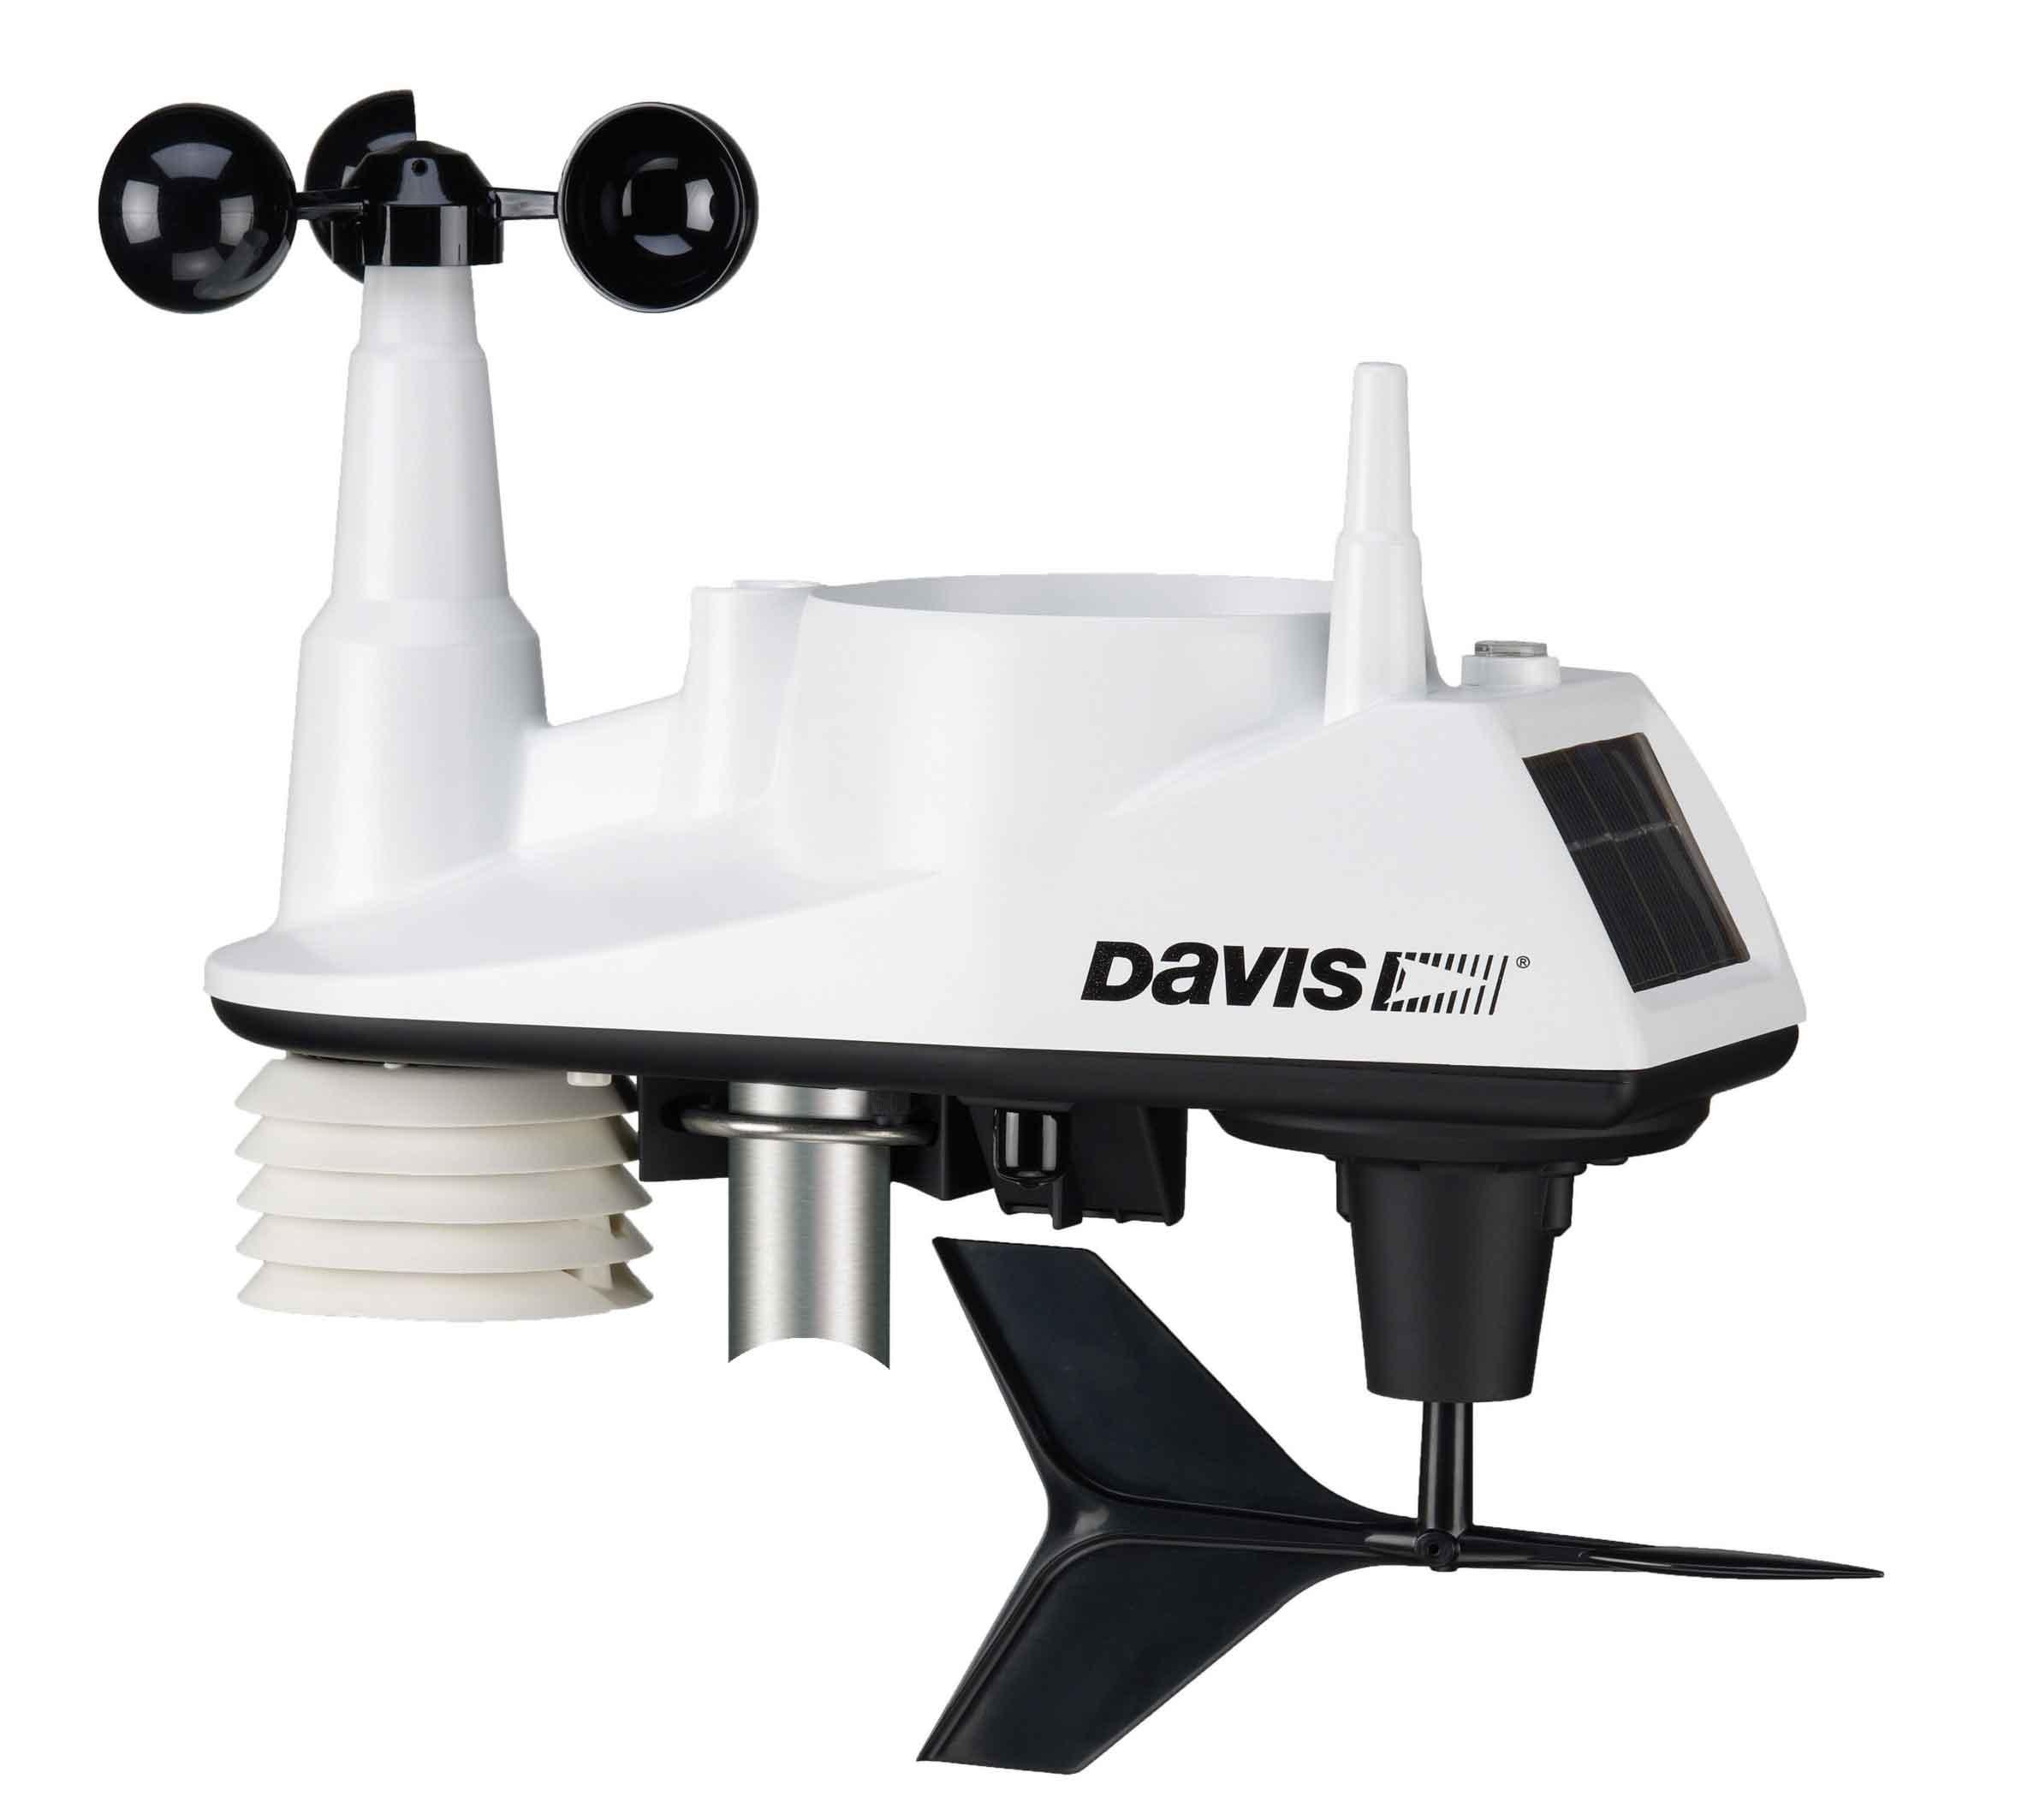 Davis WH-VP2VueSens Davis weather station combination pack